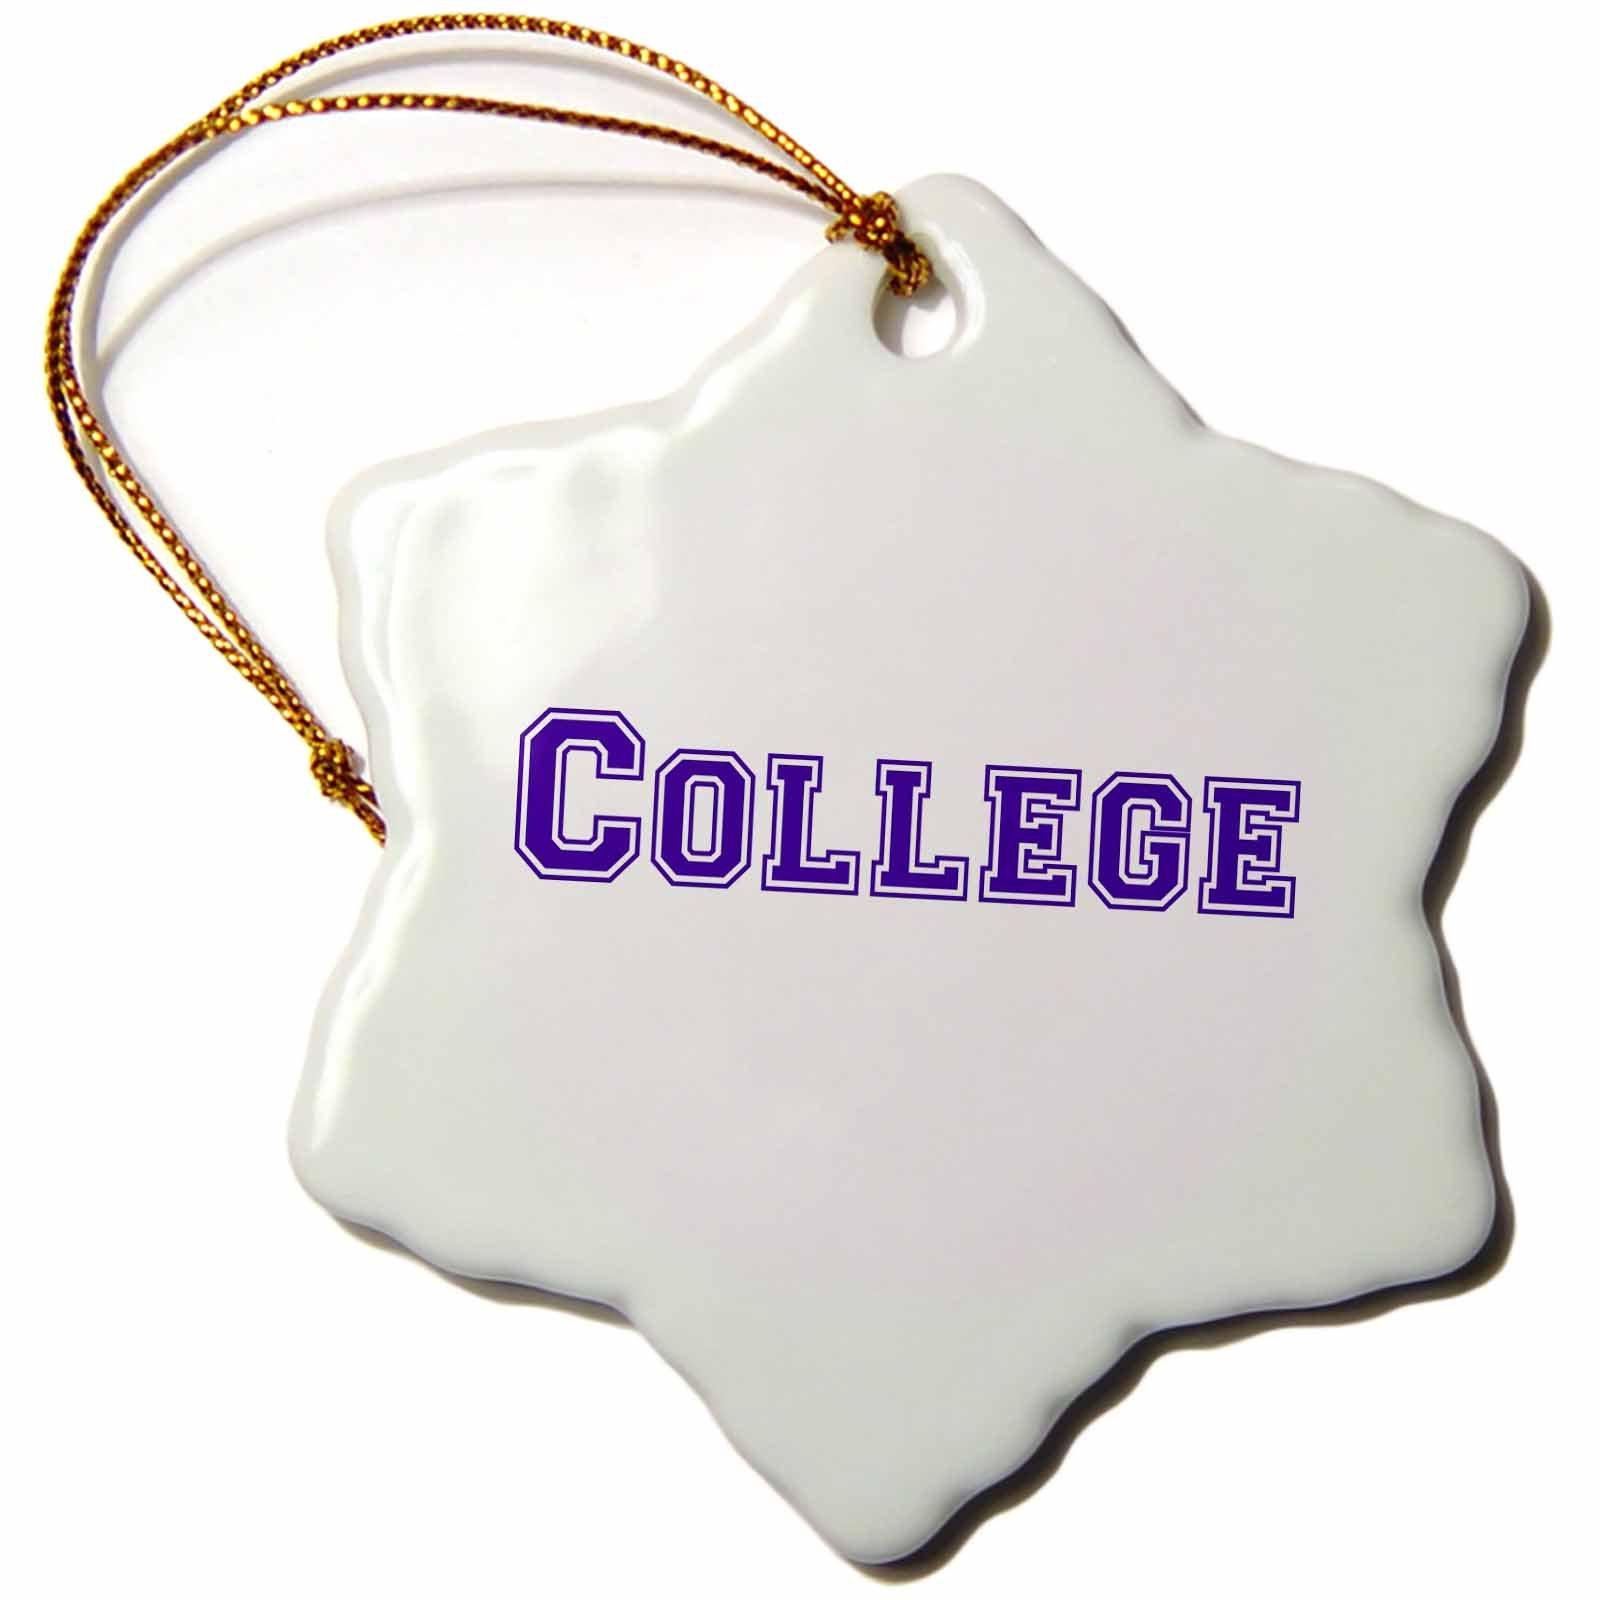 3dRose orn_151213_1 College Text Navy Blue-University Graduate School Fashion-Retro Preppy Font-Snowflake Ornament, 3-Inch, Porcelain